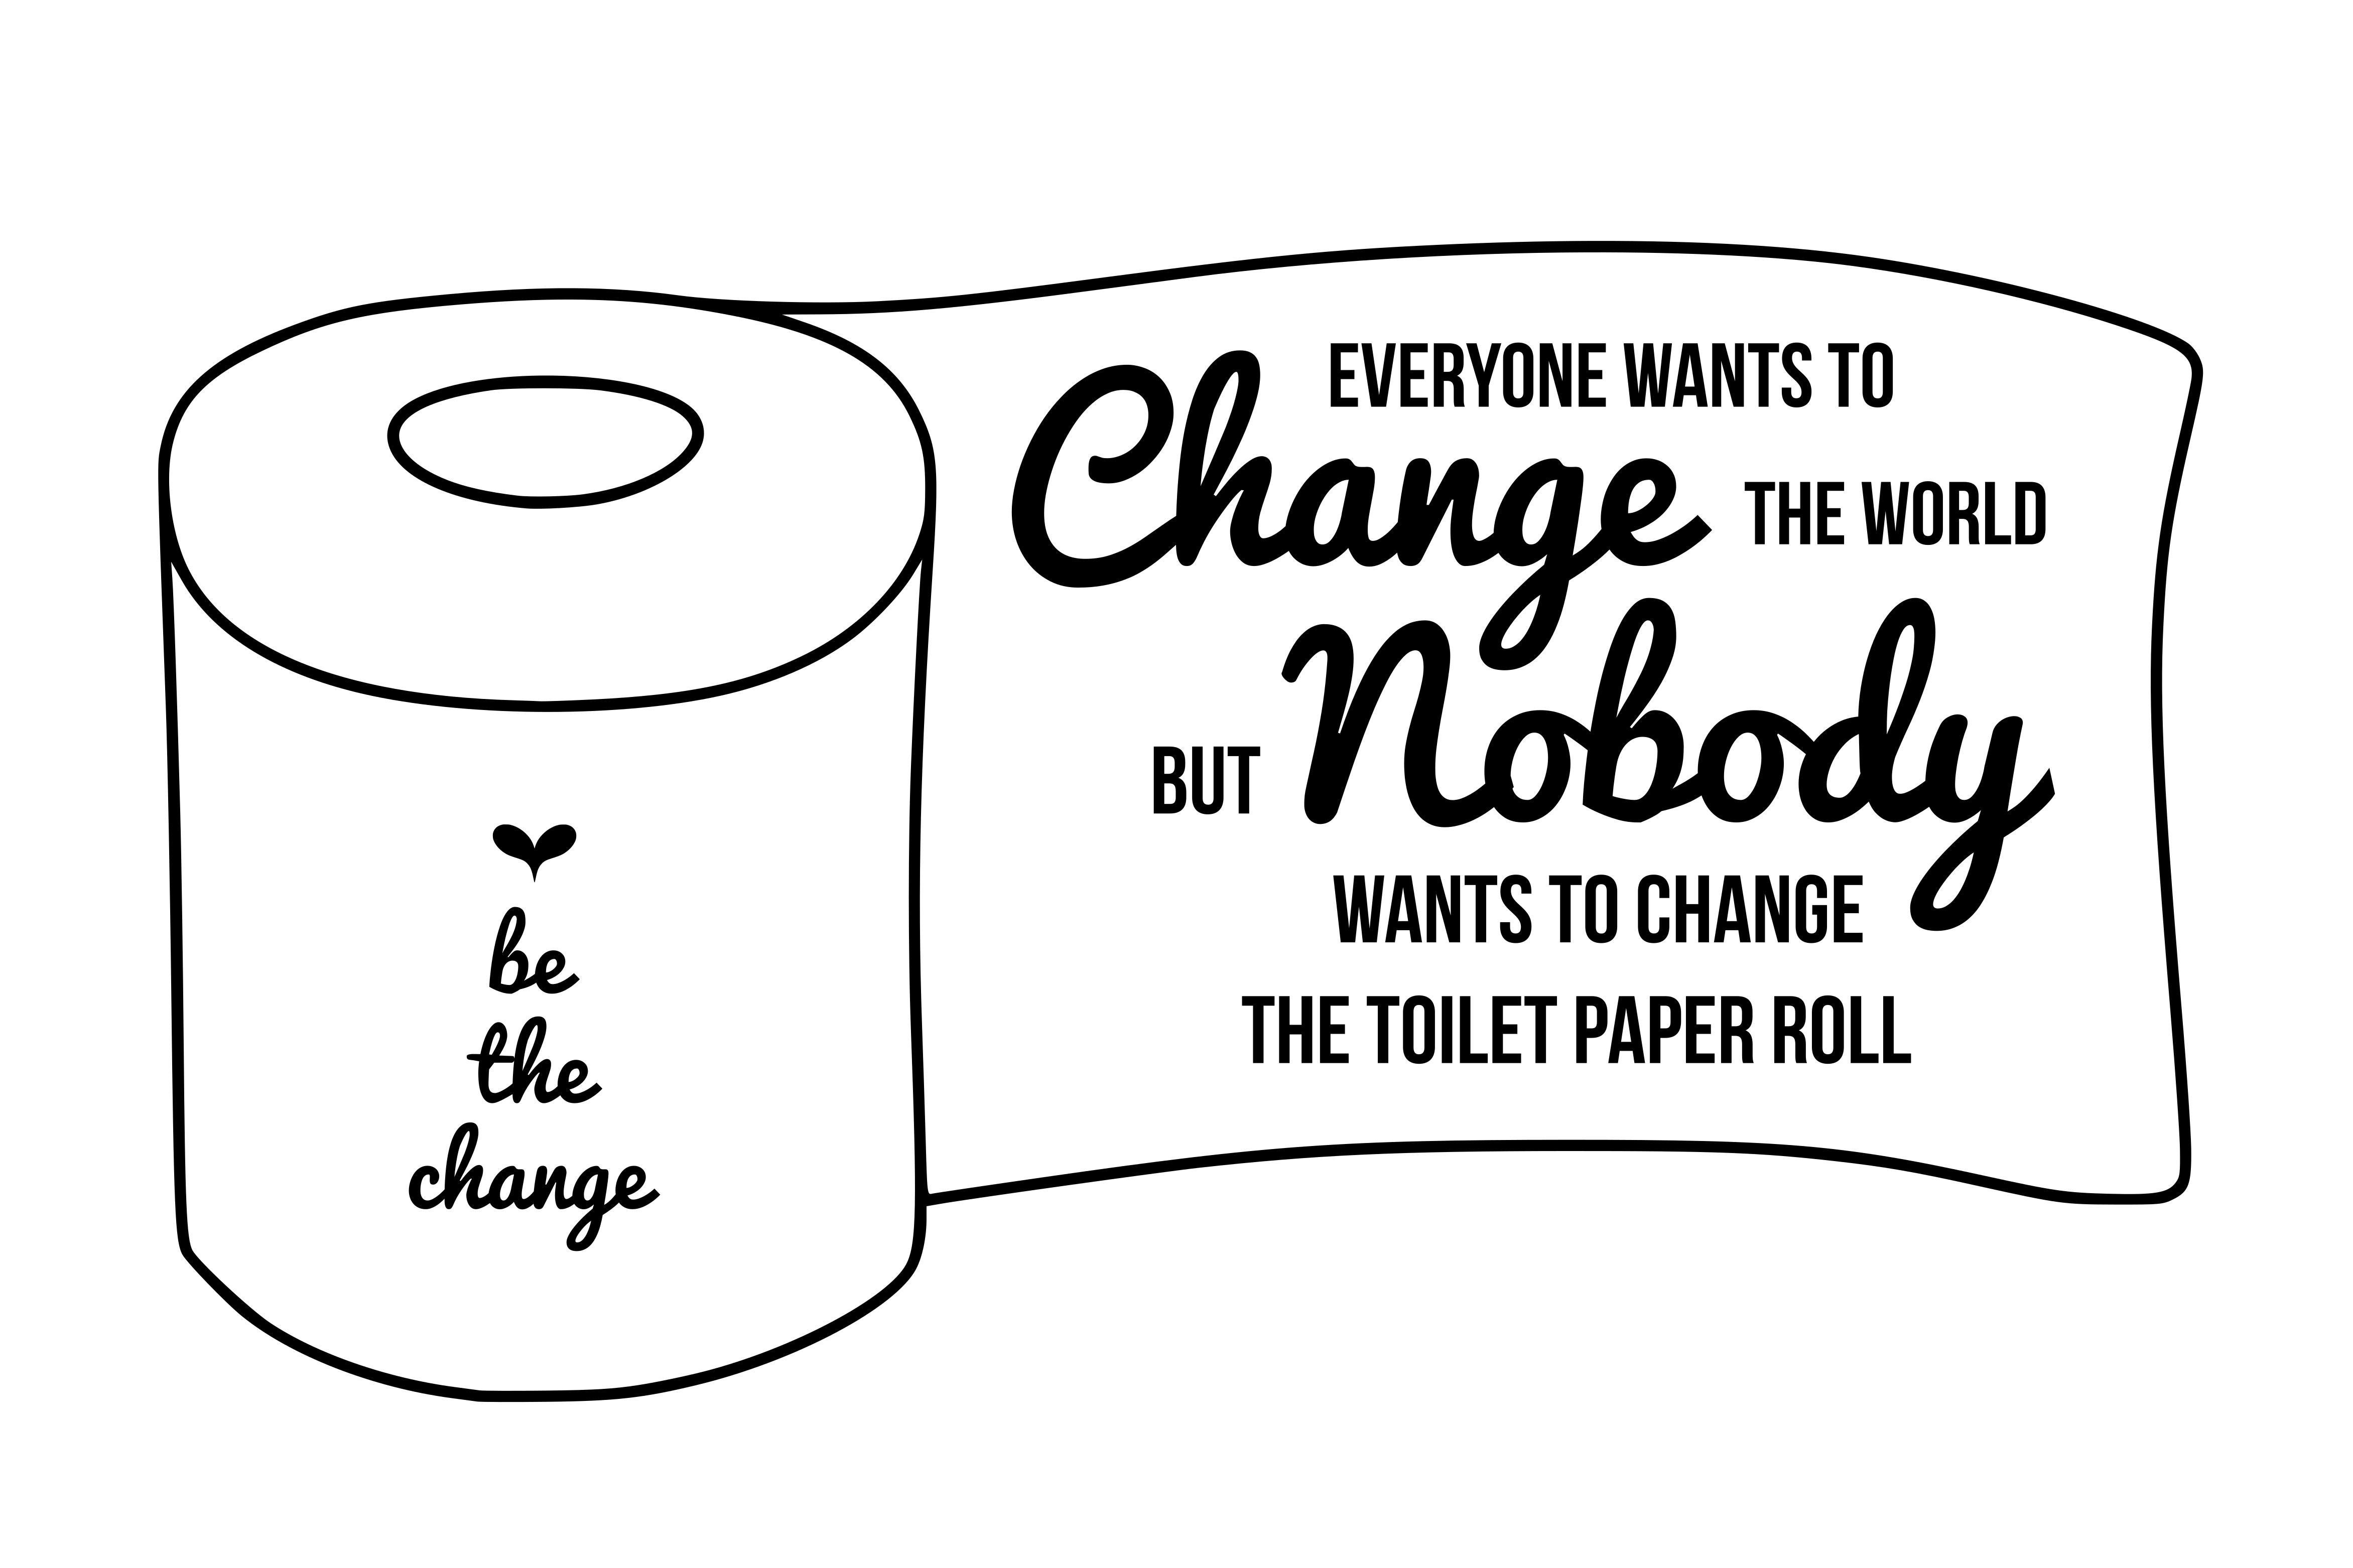 Bathroom Svg Be The Change Svg Funny Quote Svg Mom Svg 70330 Svgs Design Bundles Bathroom Svg Svg Quotes Toilet Paper Svg